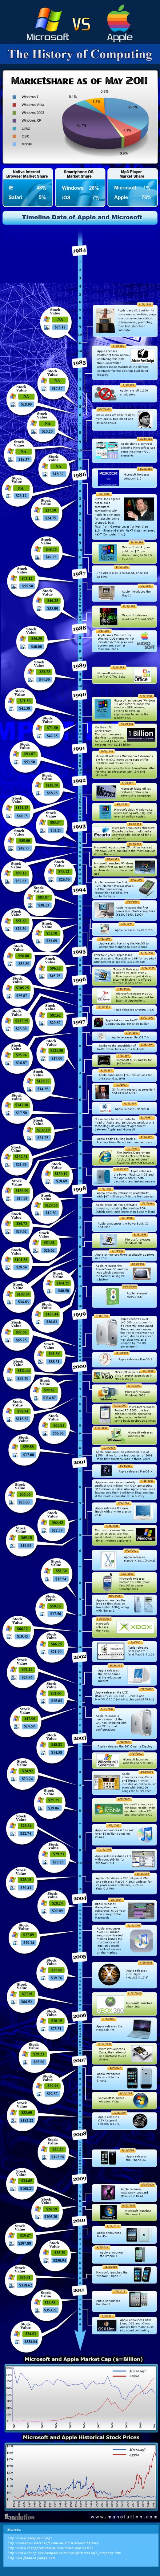 Microsoft vs. Apple - Infografik zur Geschichte der Software-Konkurrenten